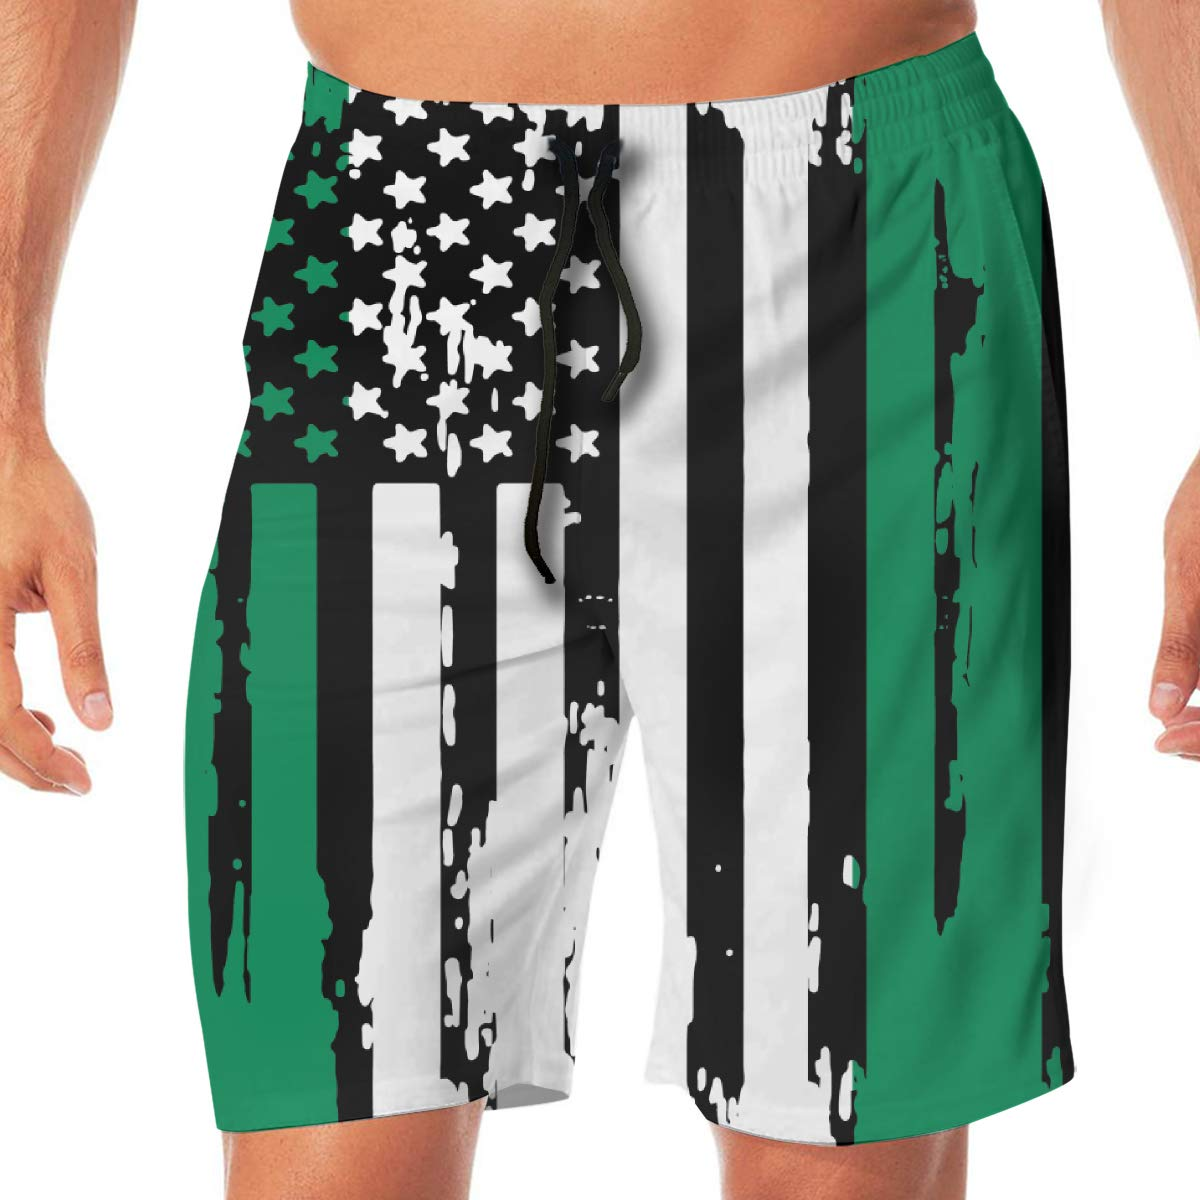 Mens Abstract American Nigerian Flag Boardshorts Beach Pants No Mesh Lining